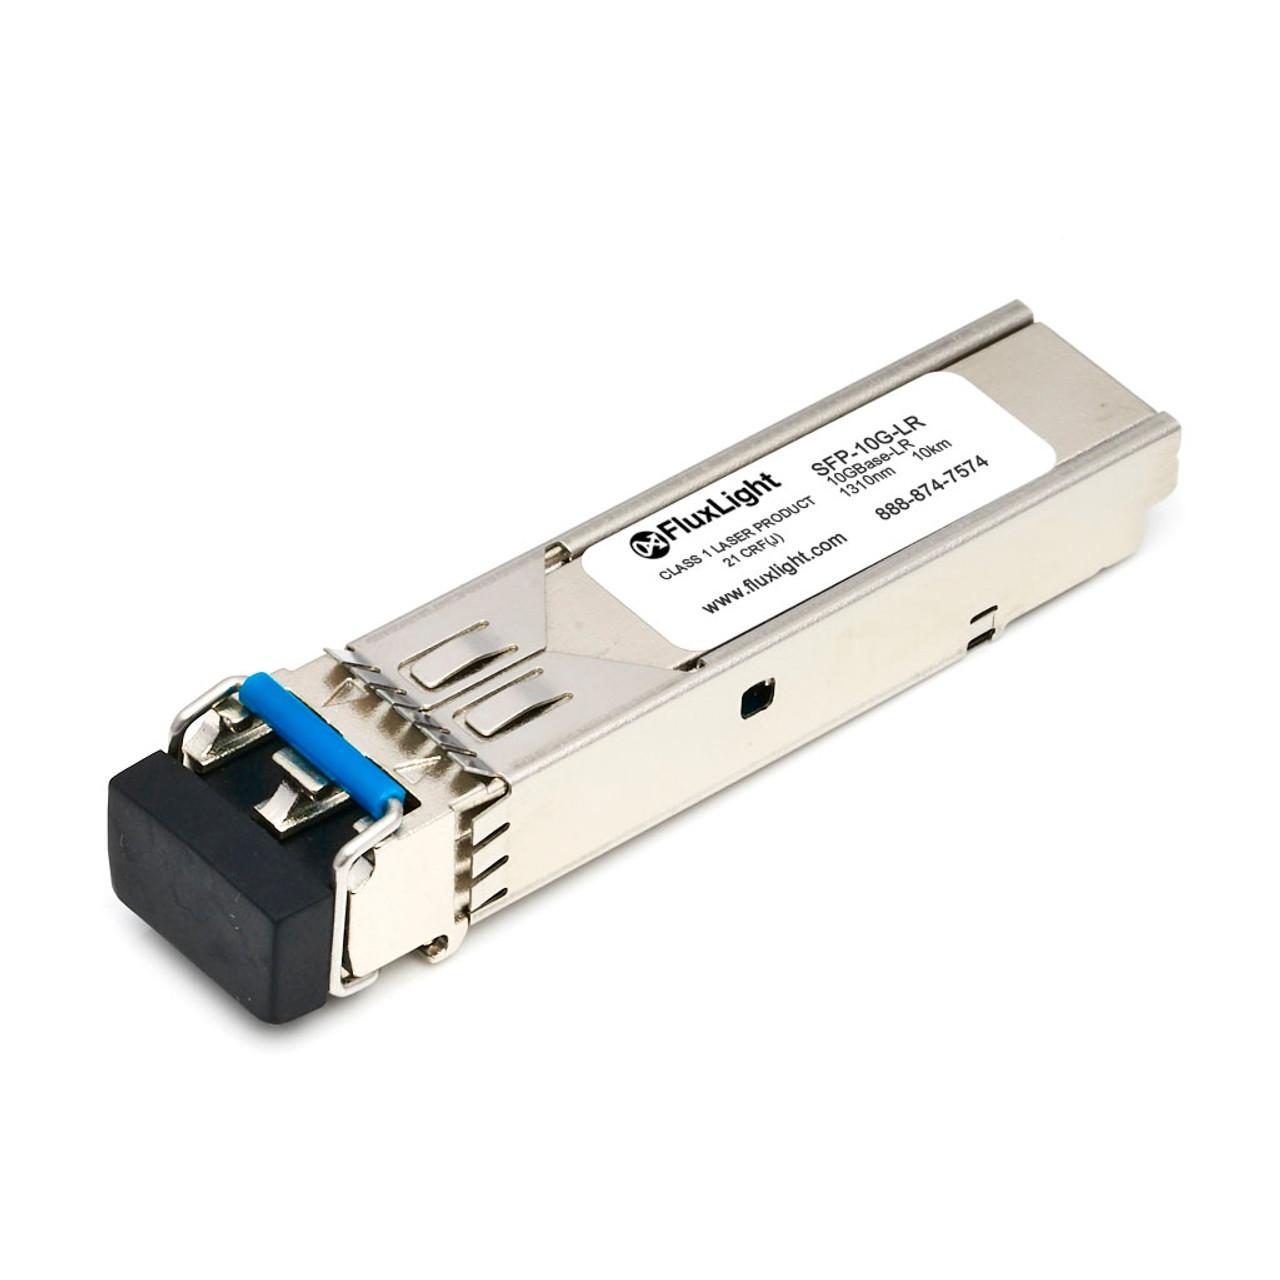 C6800-SUP6T-XL Compatible SFP-10G-LR for Cisco Catalyst 6800 Series